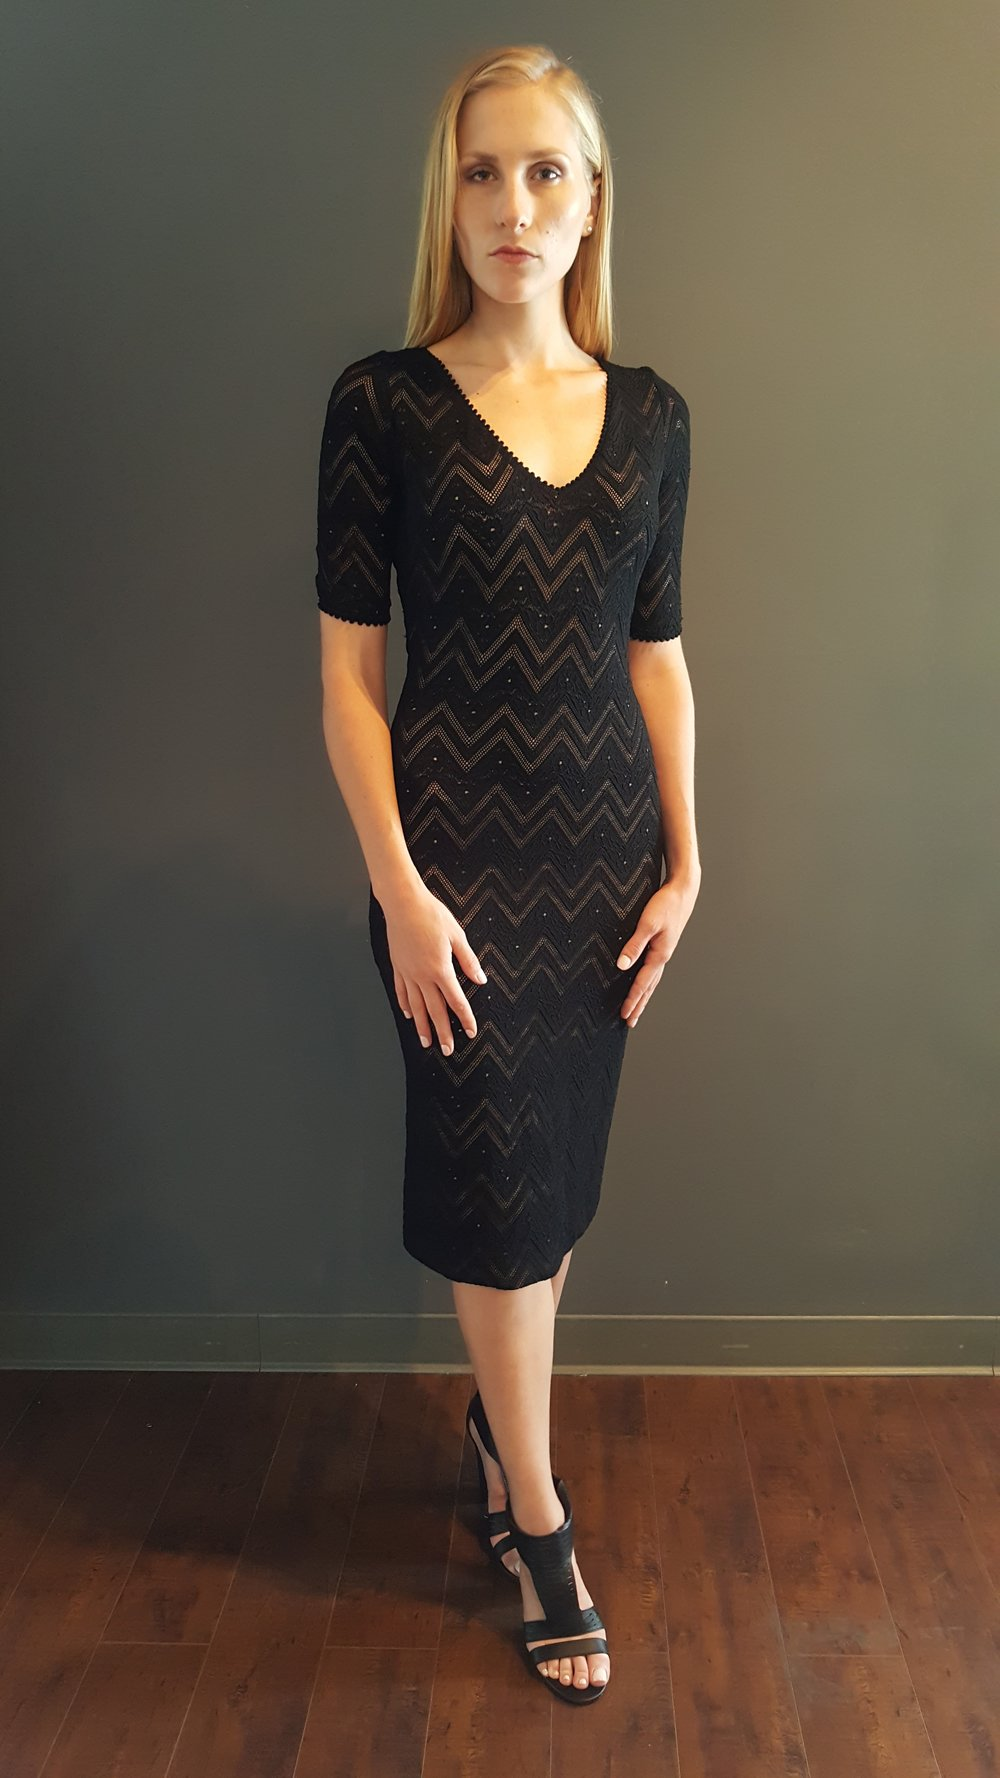 V-Neck Chevron Knit Dress